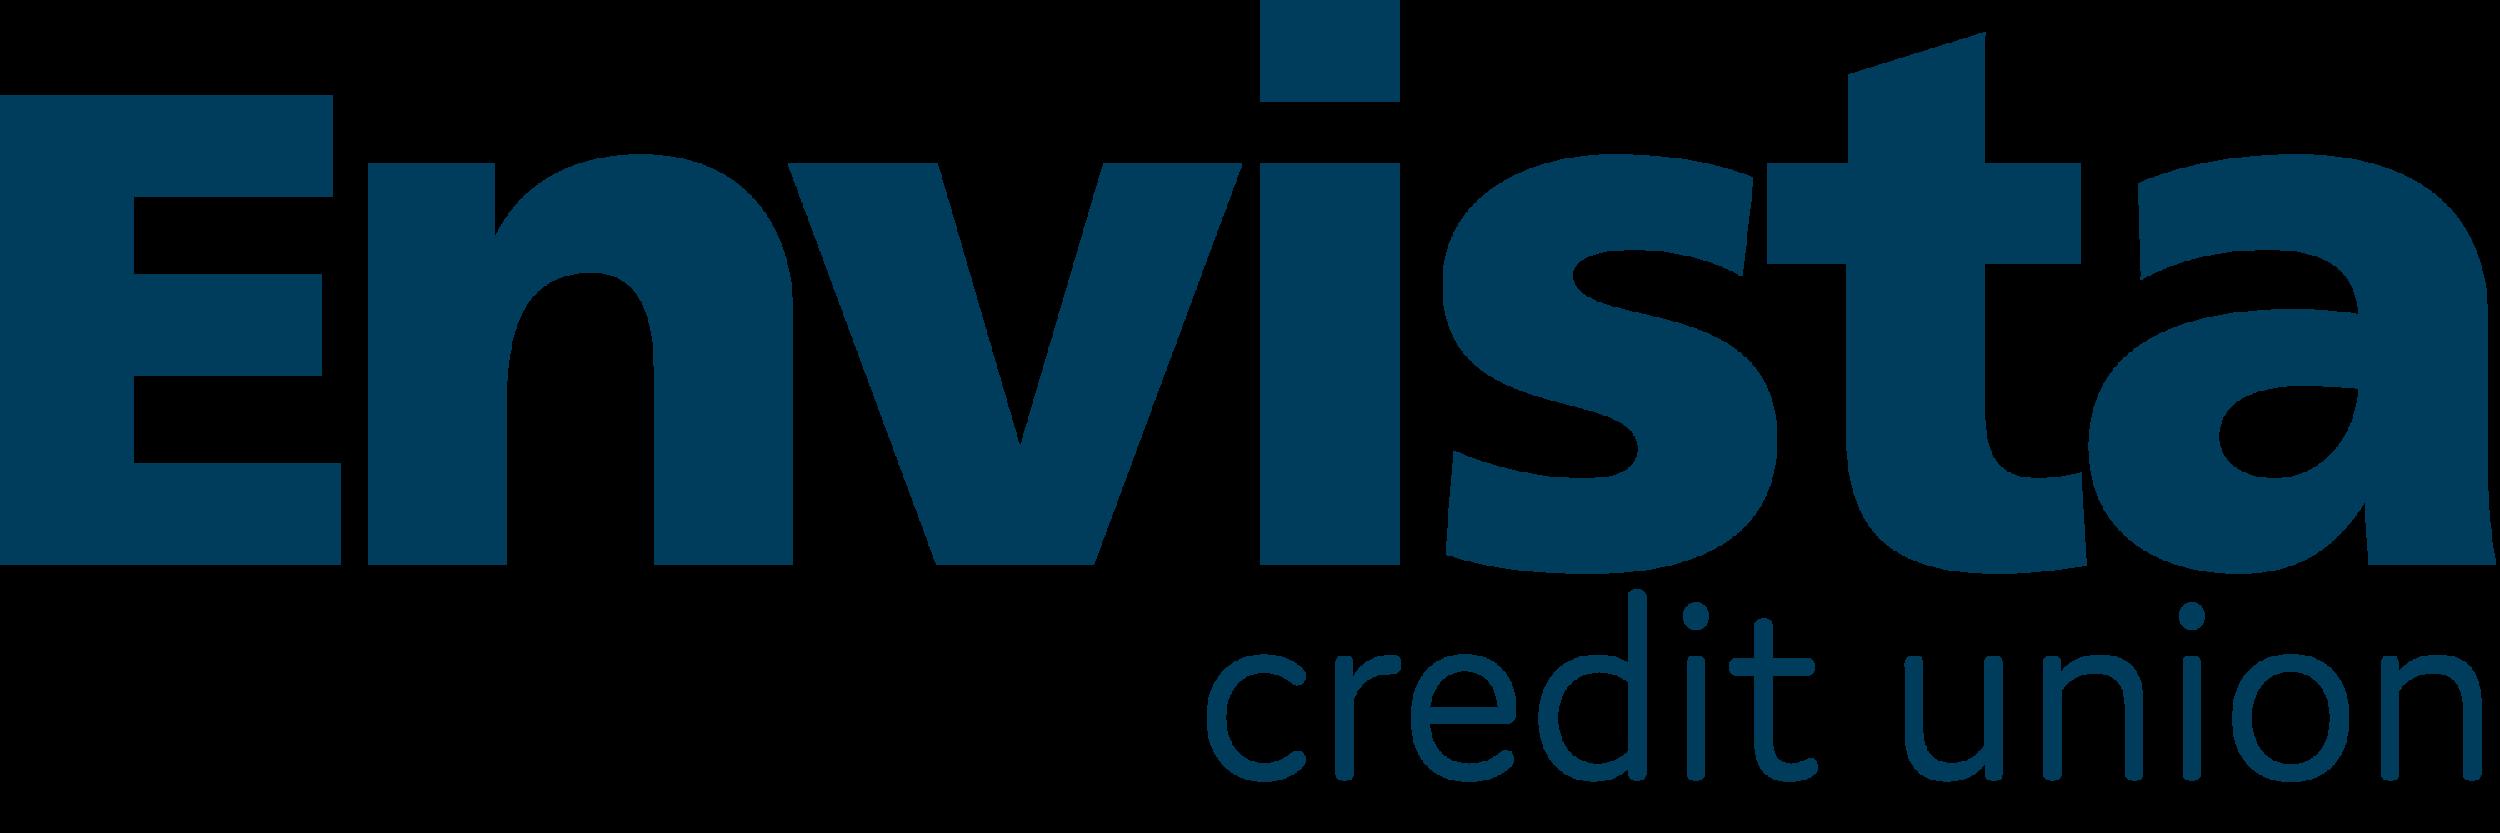 Envista Credit Union Logo.png